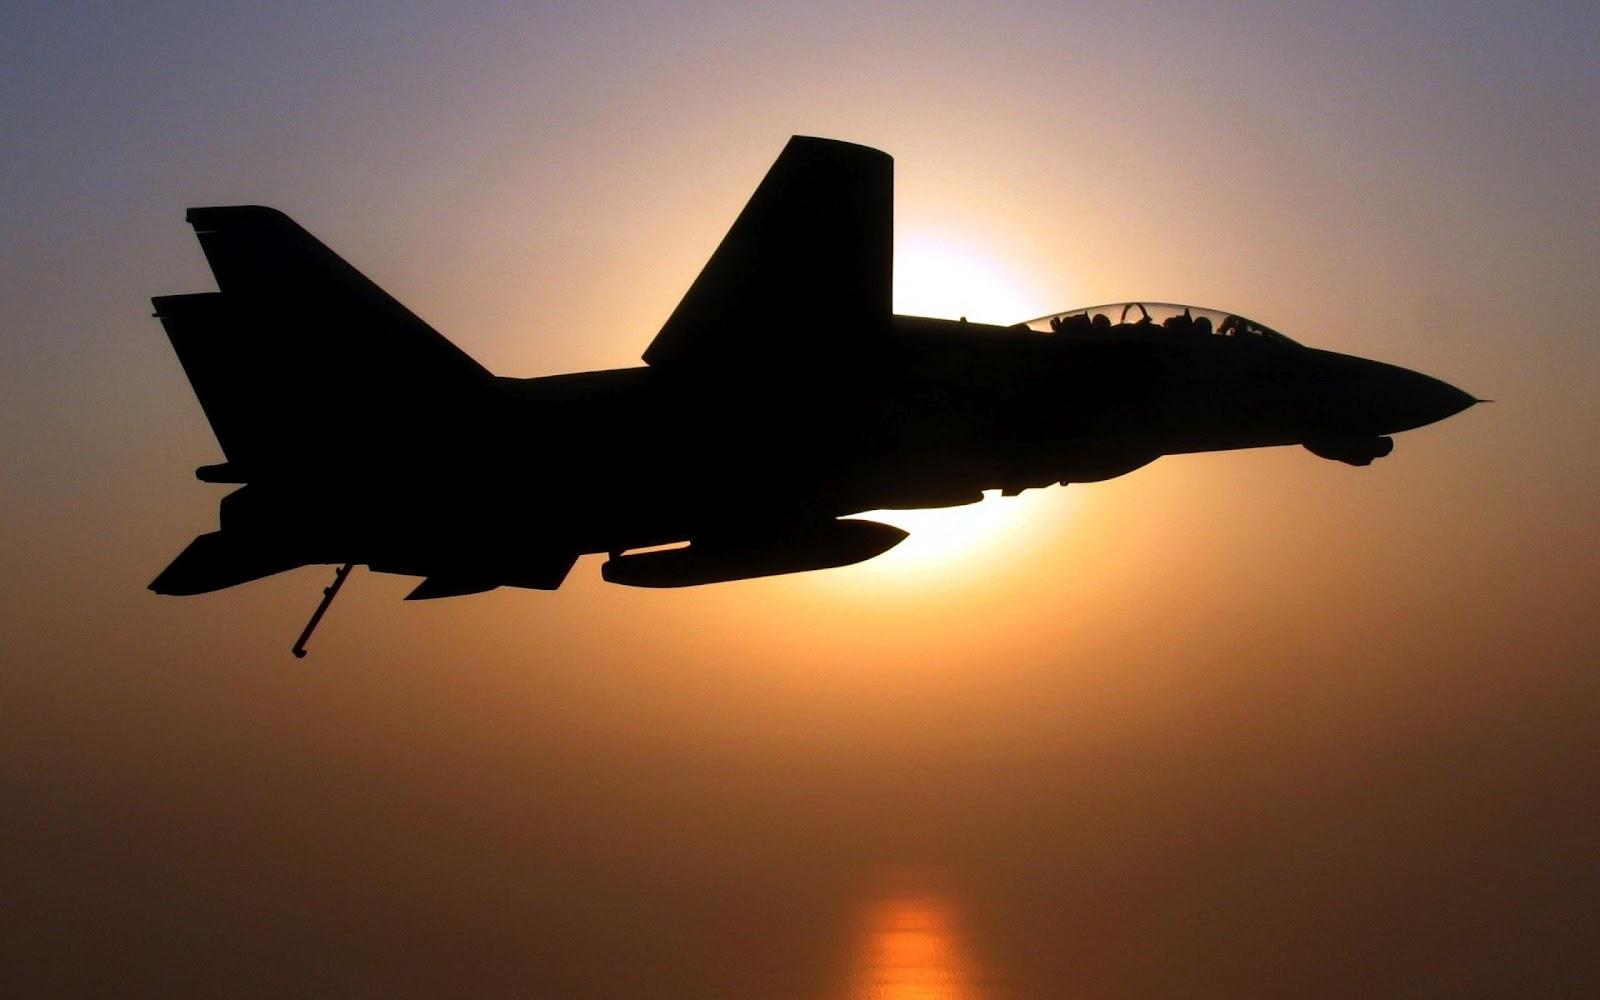 Guns & Weapons: F-14 Tomcat